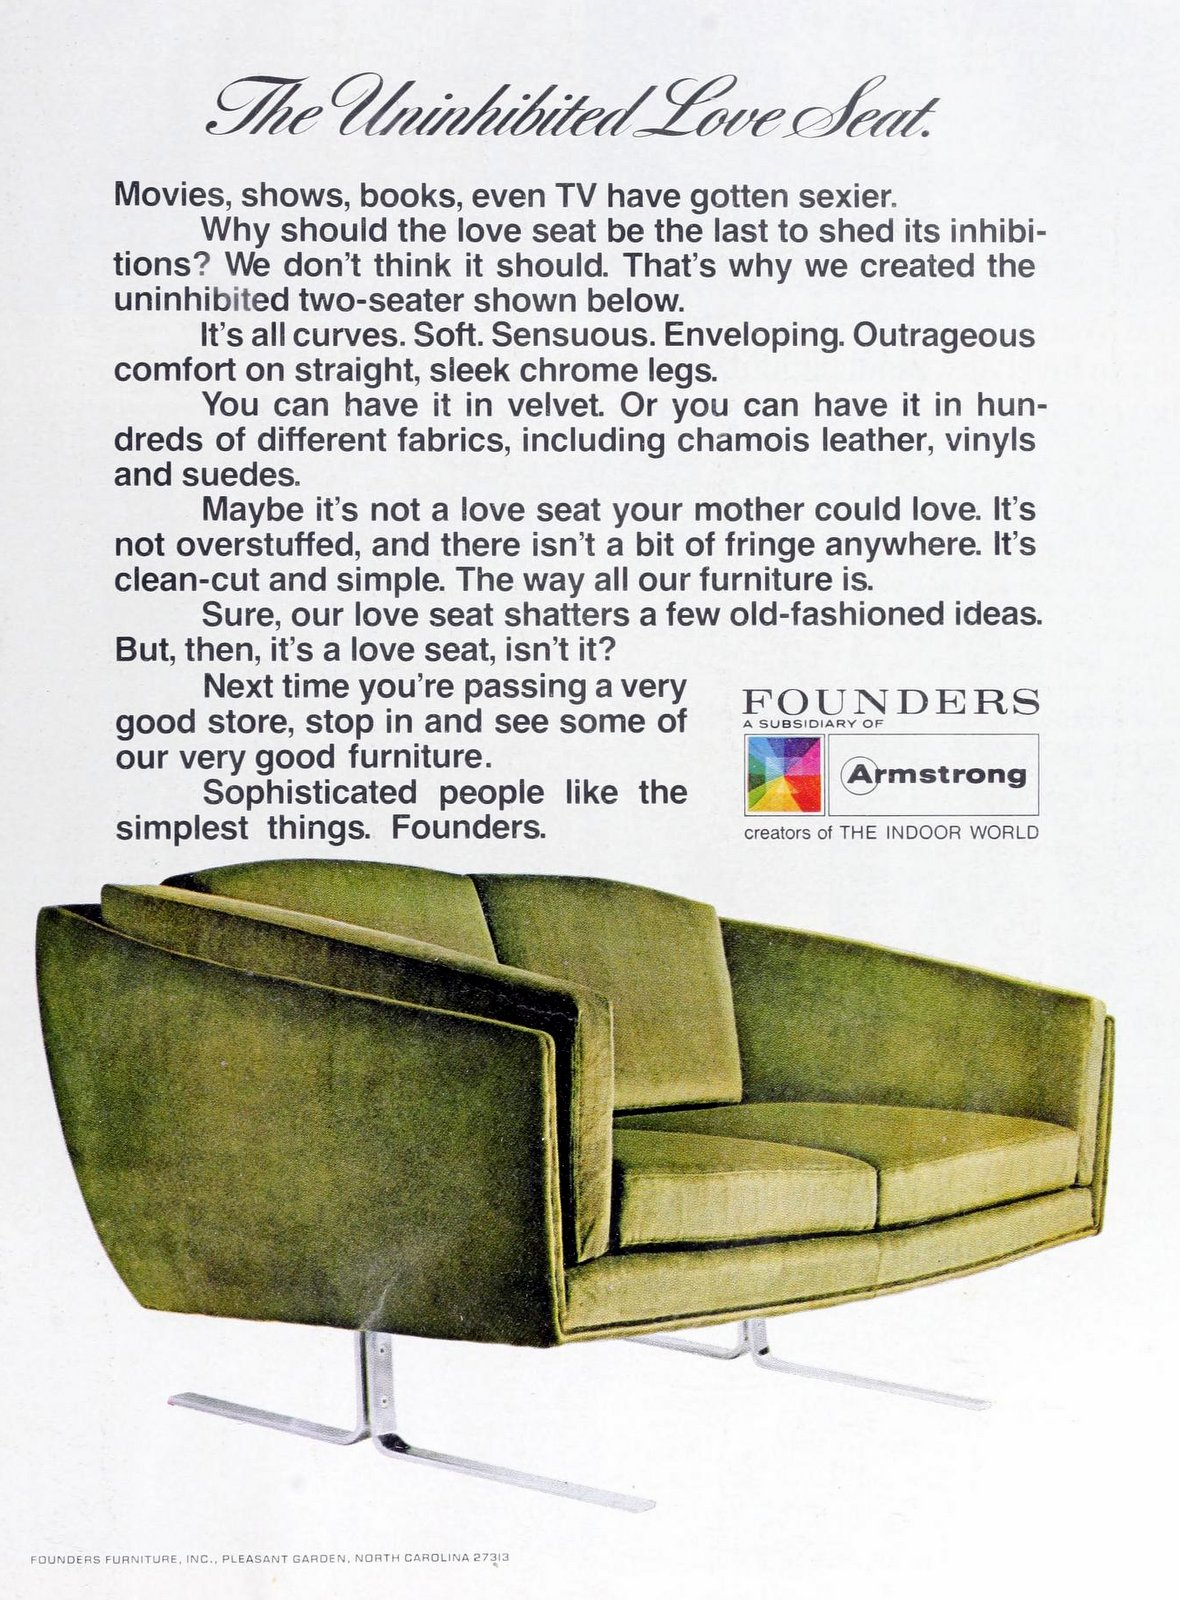 Curvy mod sixties green velvet love seat on thin metal legs (1969)